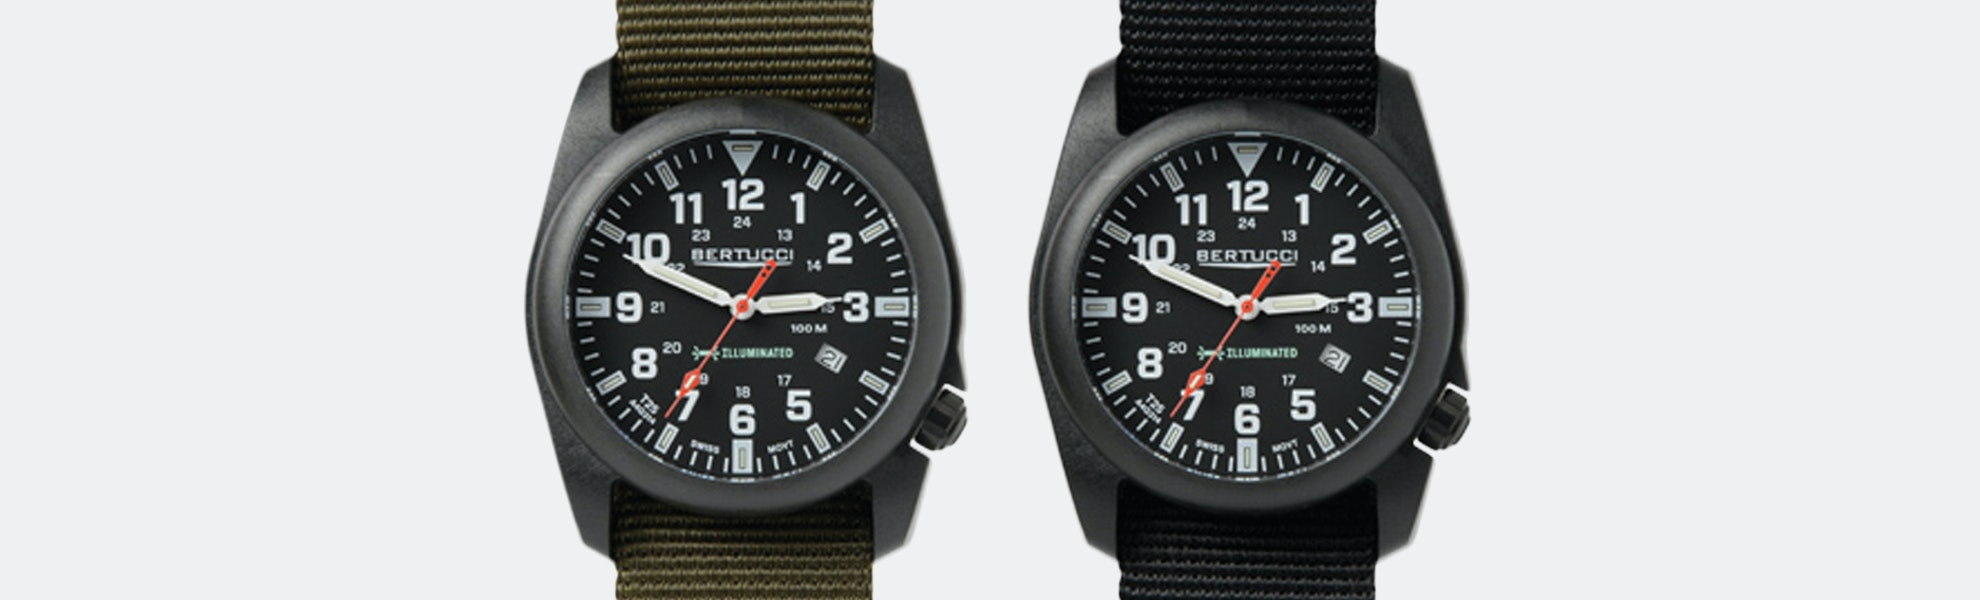 Bertucci A-5P Illuminated EDC Watch